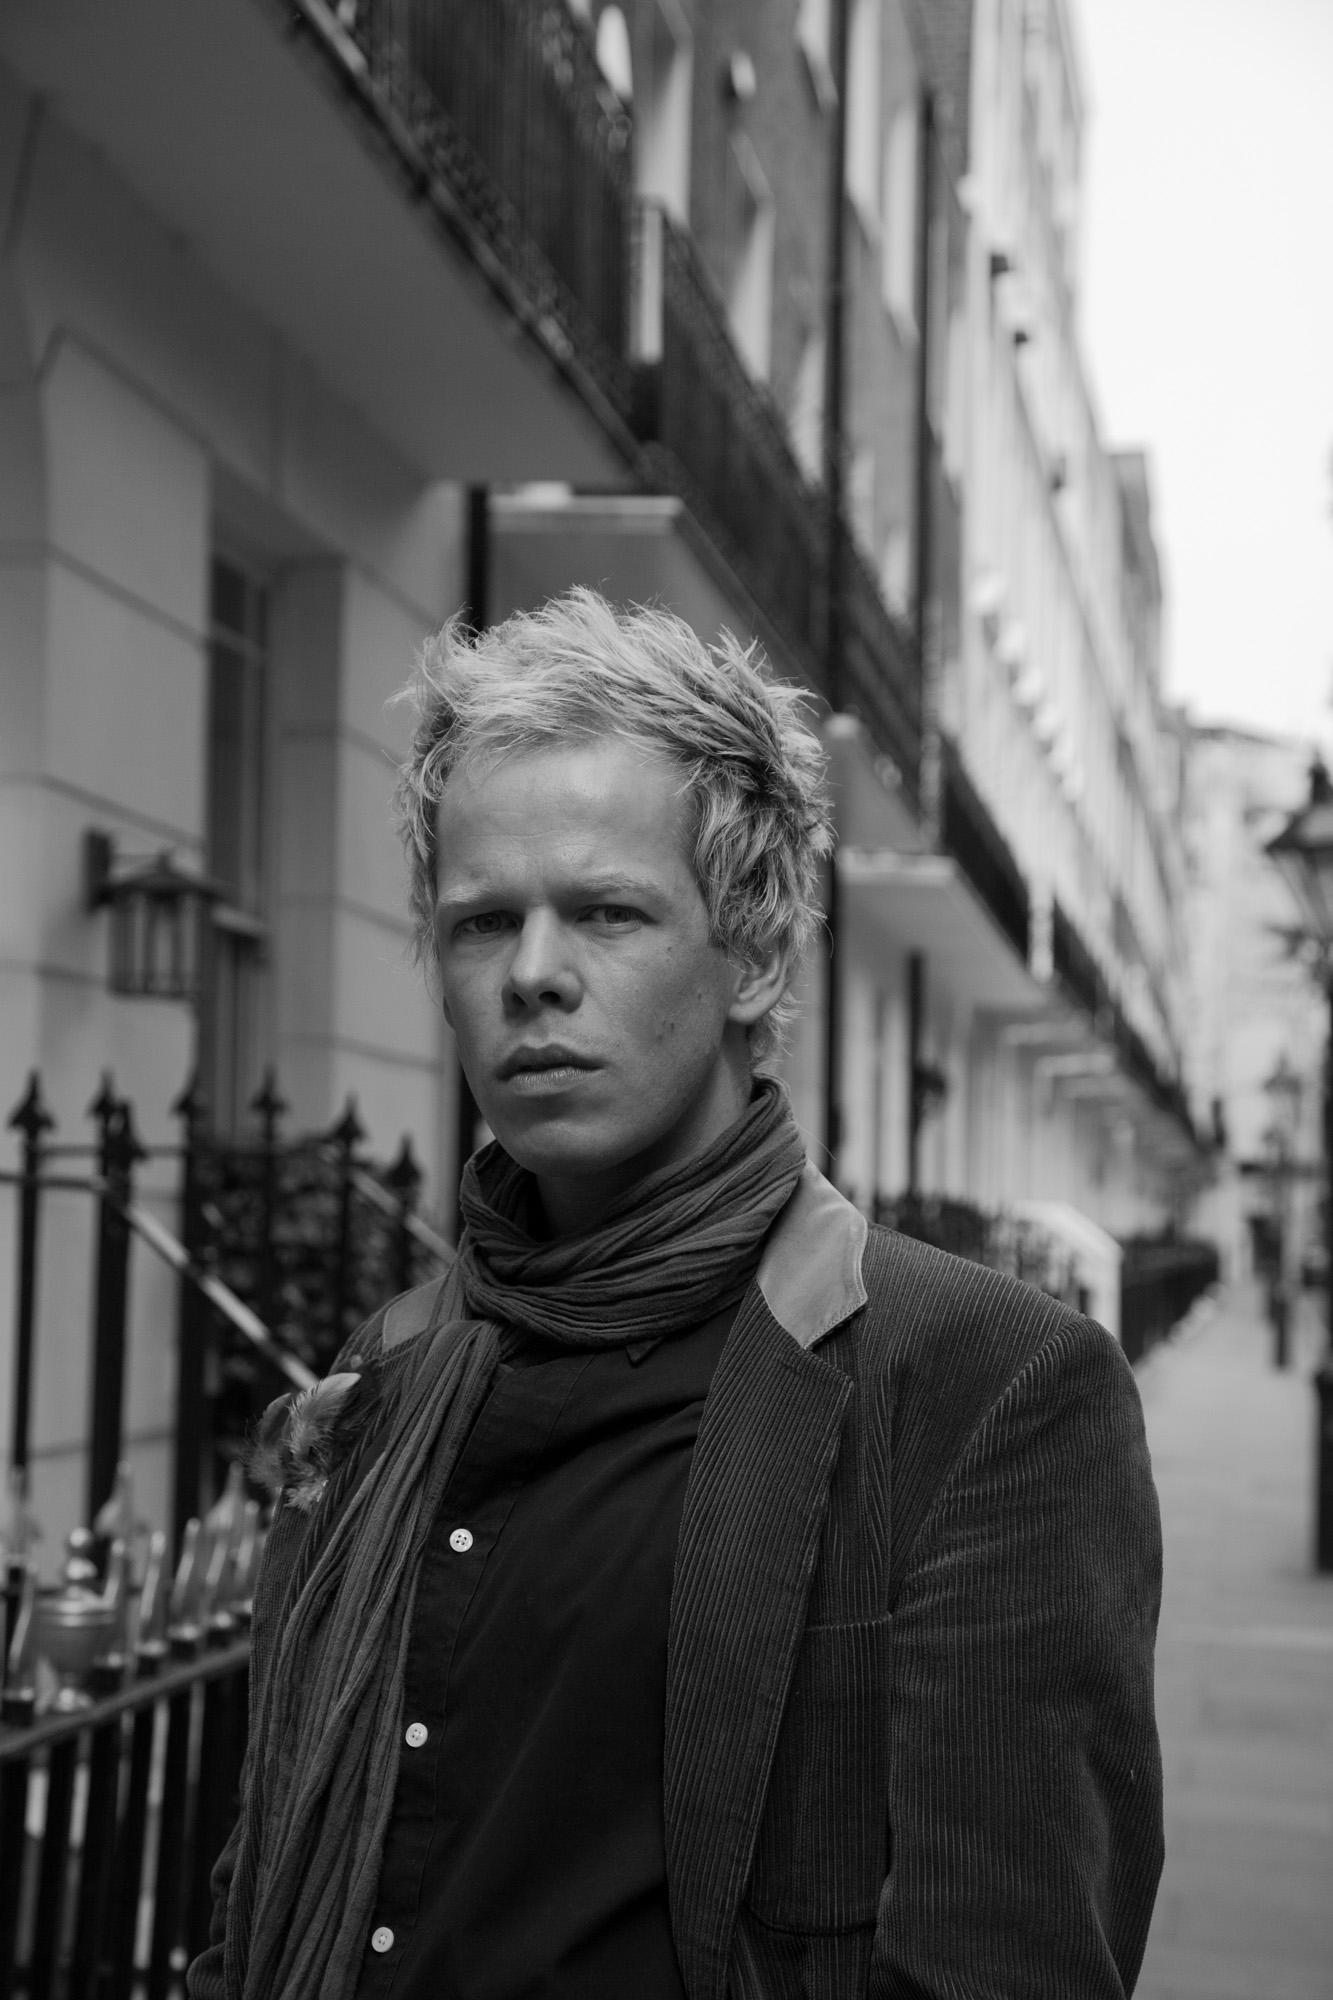 portraits-photographer-oxford-london-jonathan-self-photography_-46.jpg